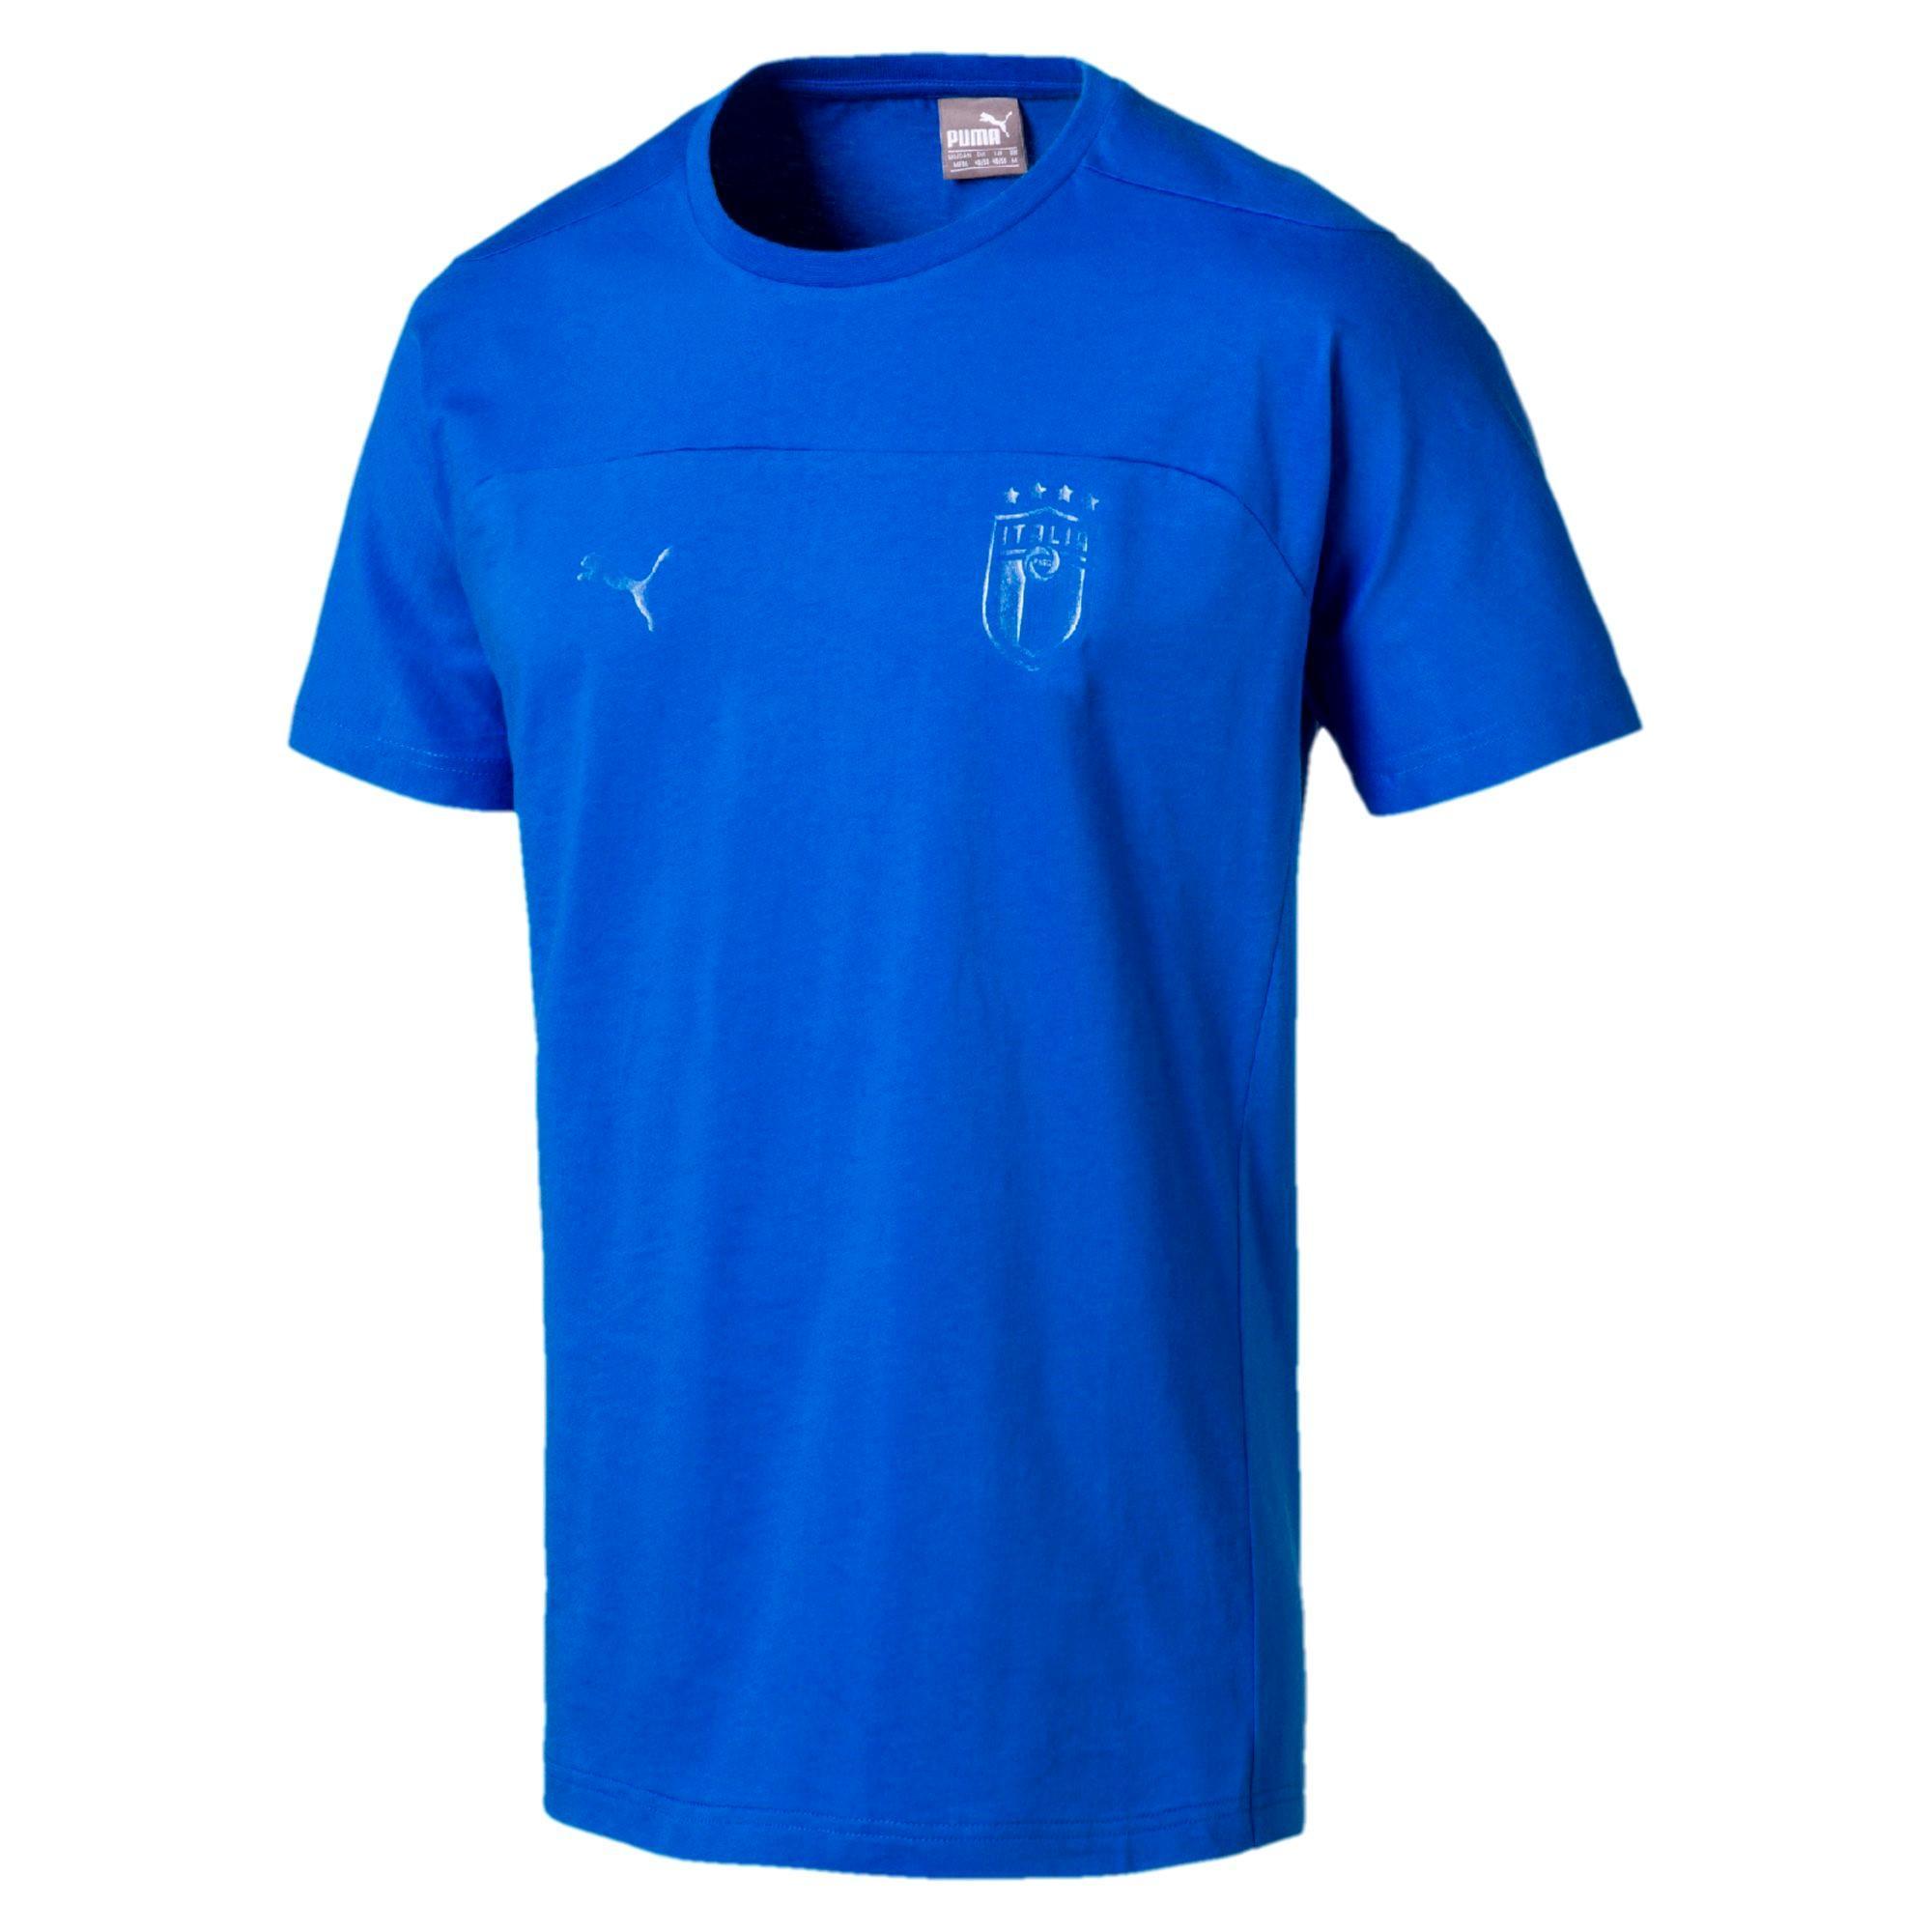 7d43ebaf2a17 Puma T-shirt Figc Azzurri Italy Team Power Blue - Tifoshop.com